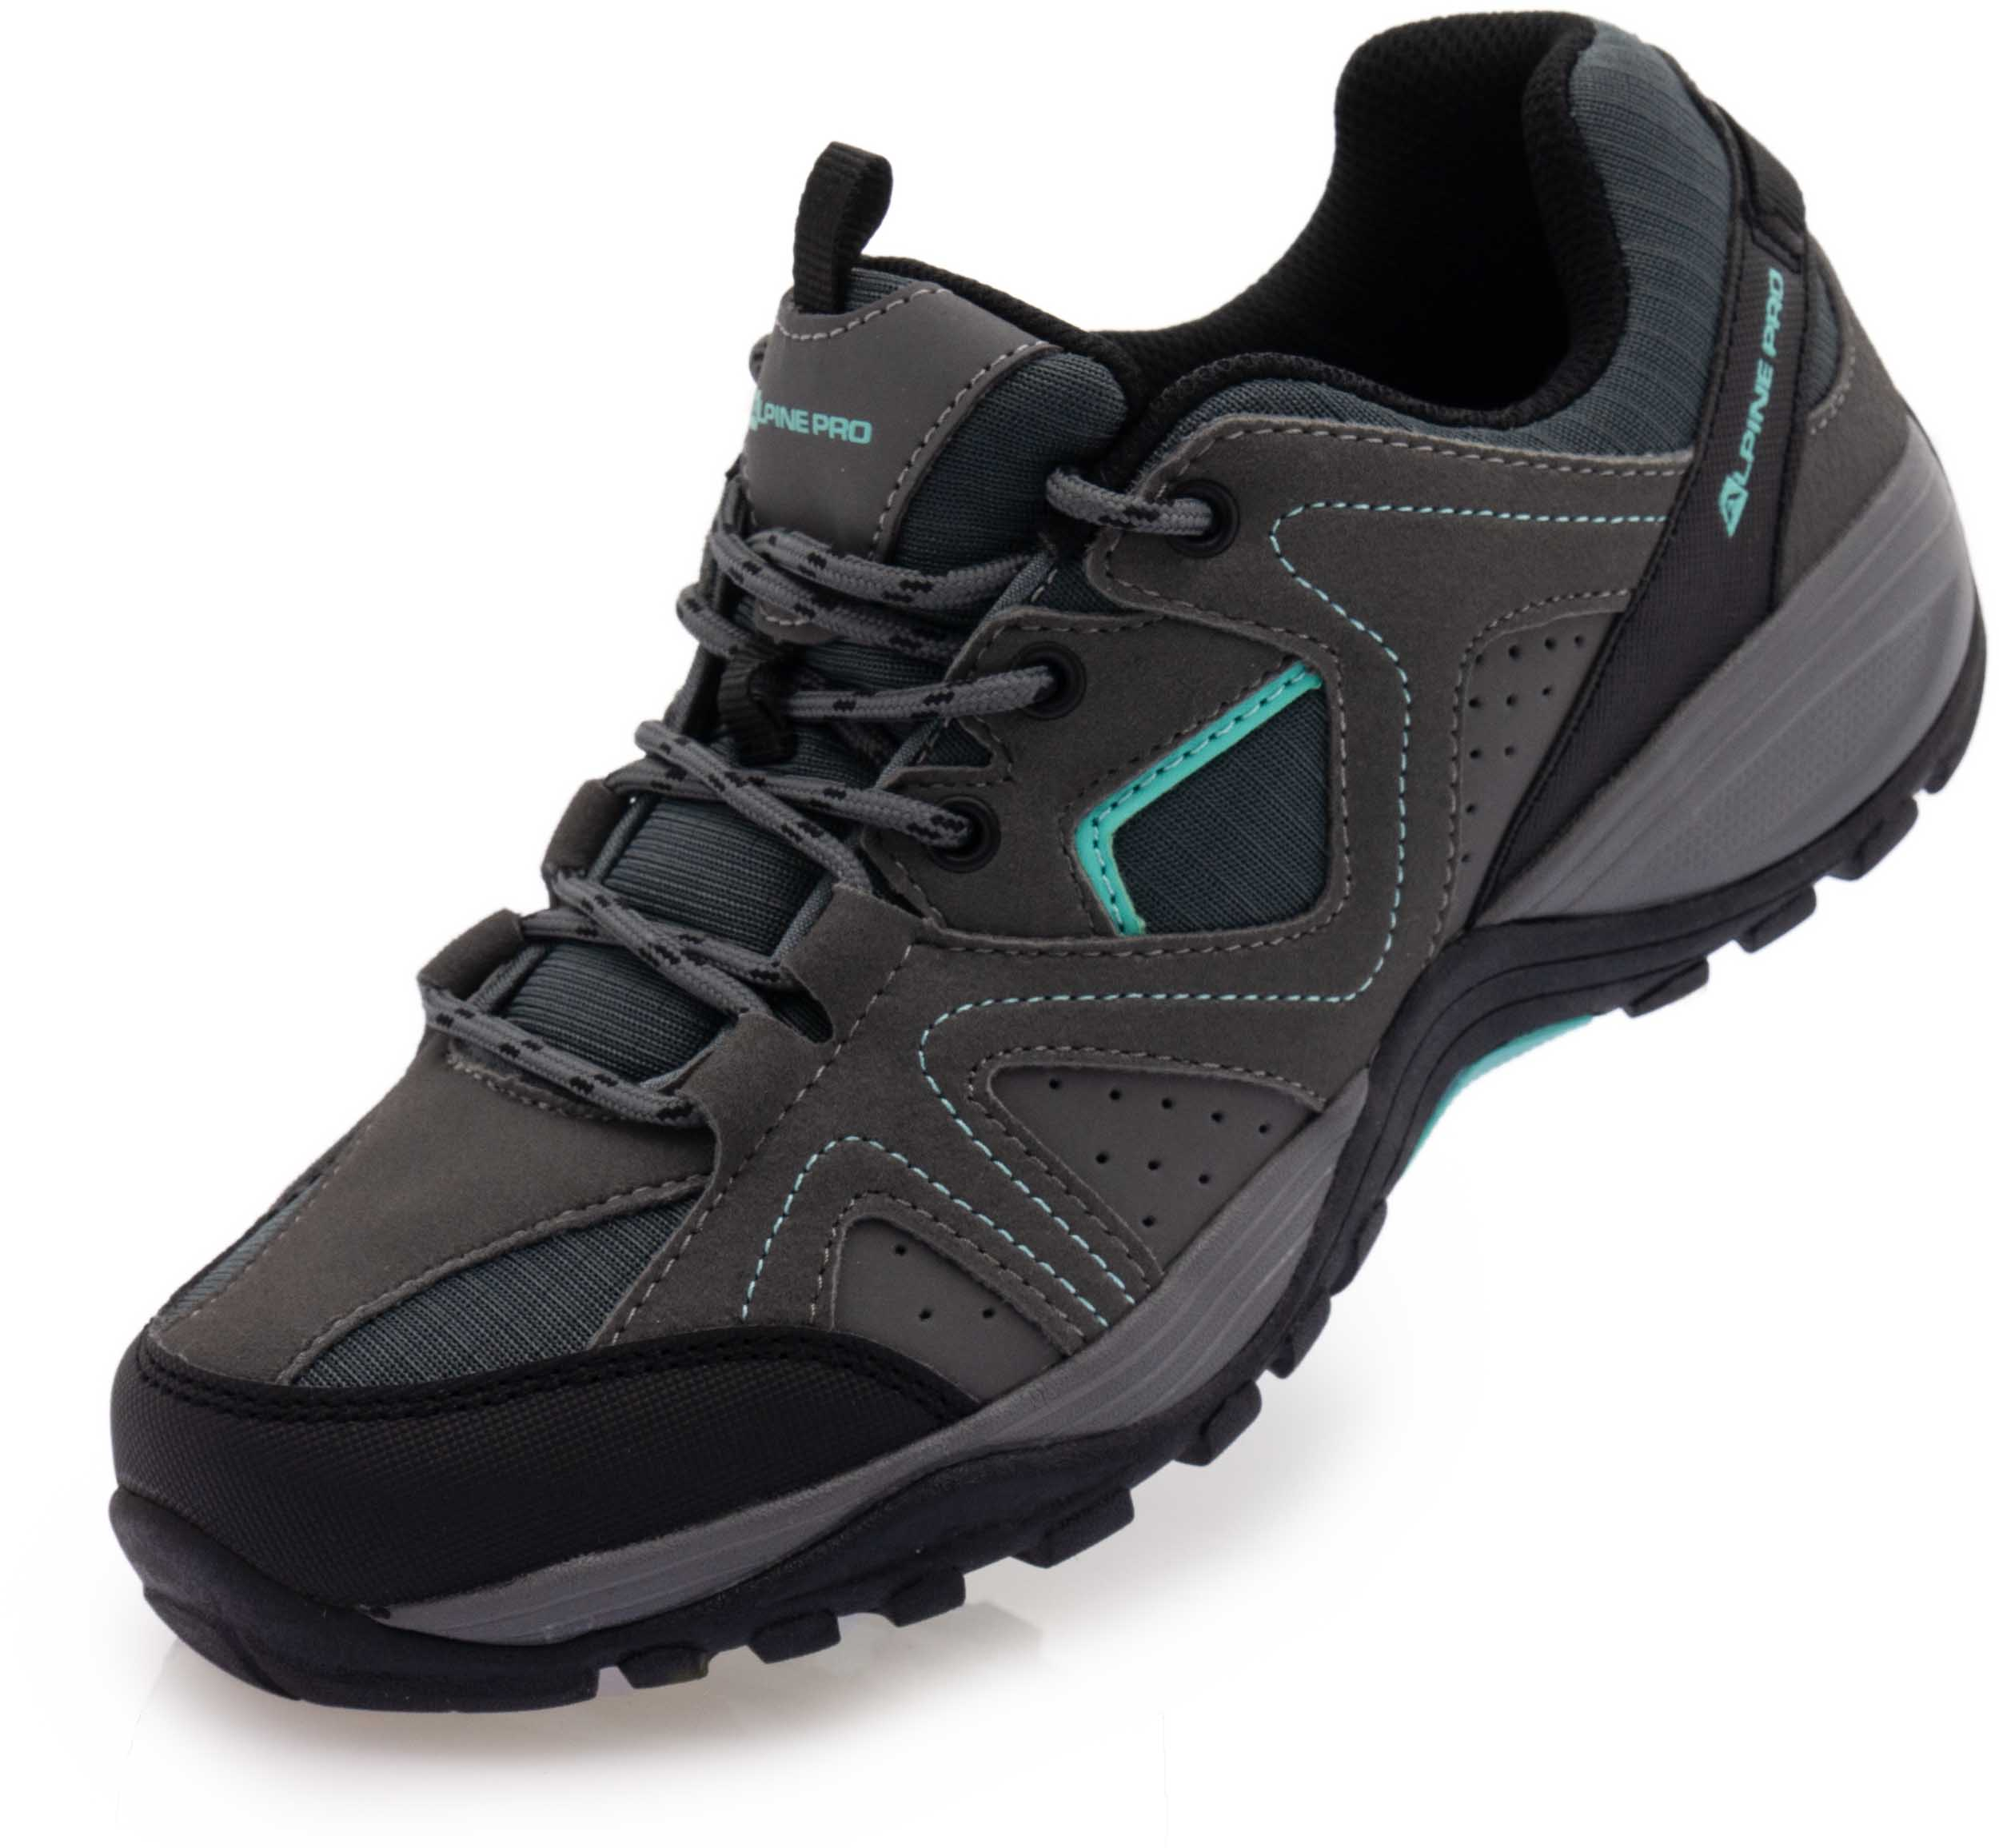 Obuv   Dámská treková obuv Alpine Pro Erva 3049dd779ec